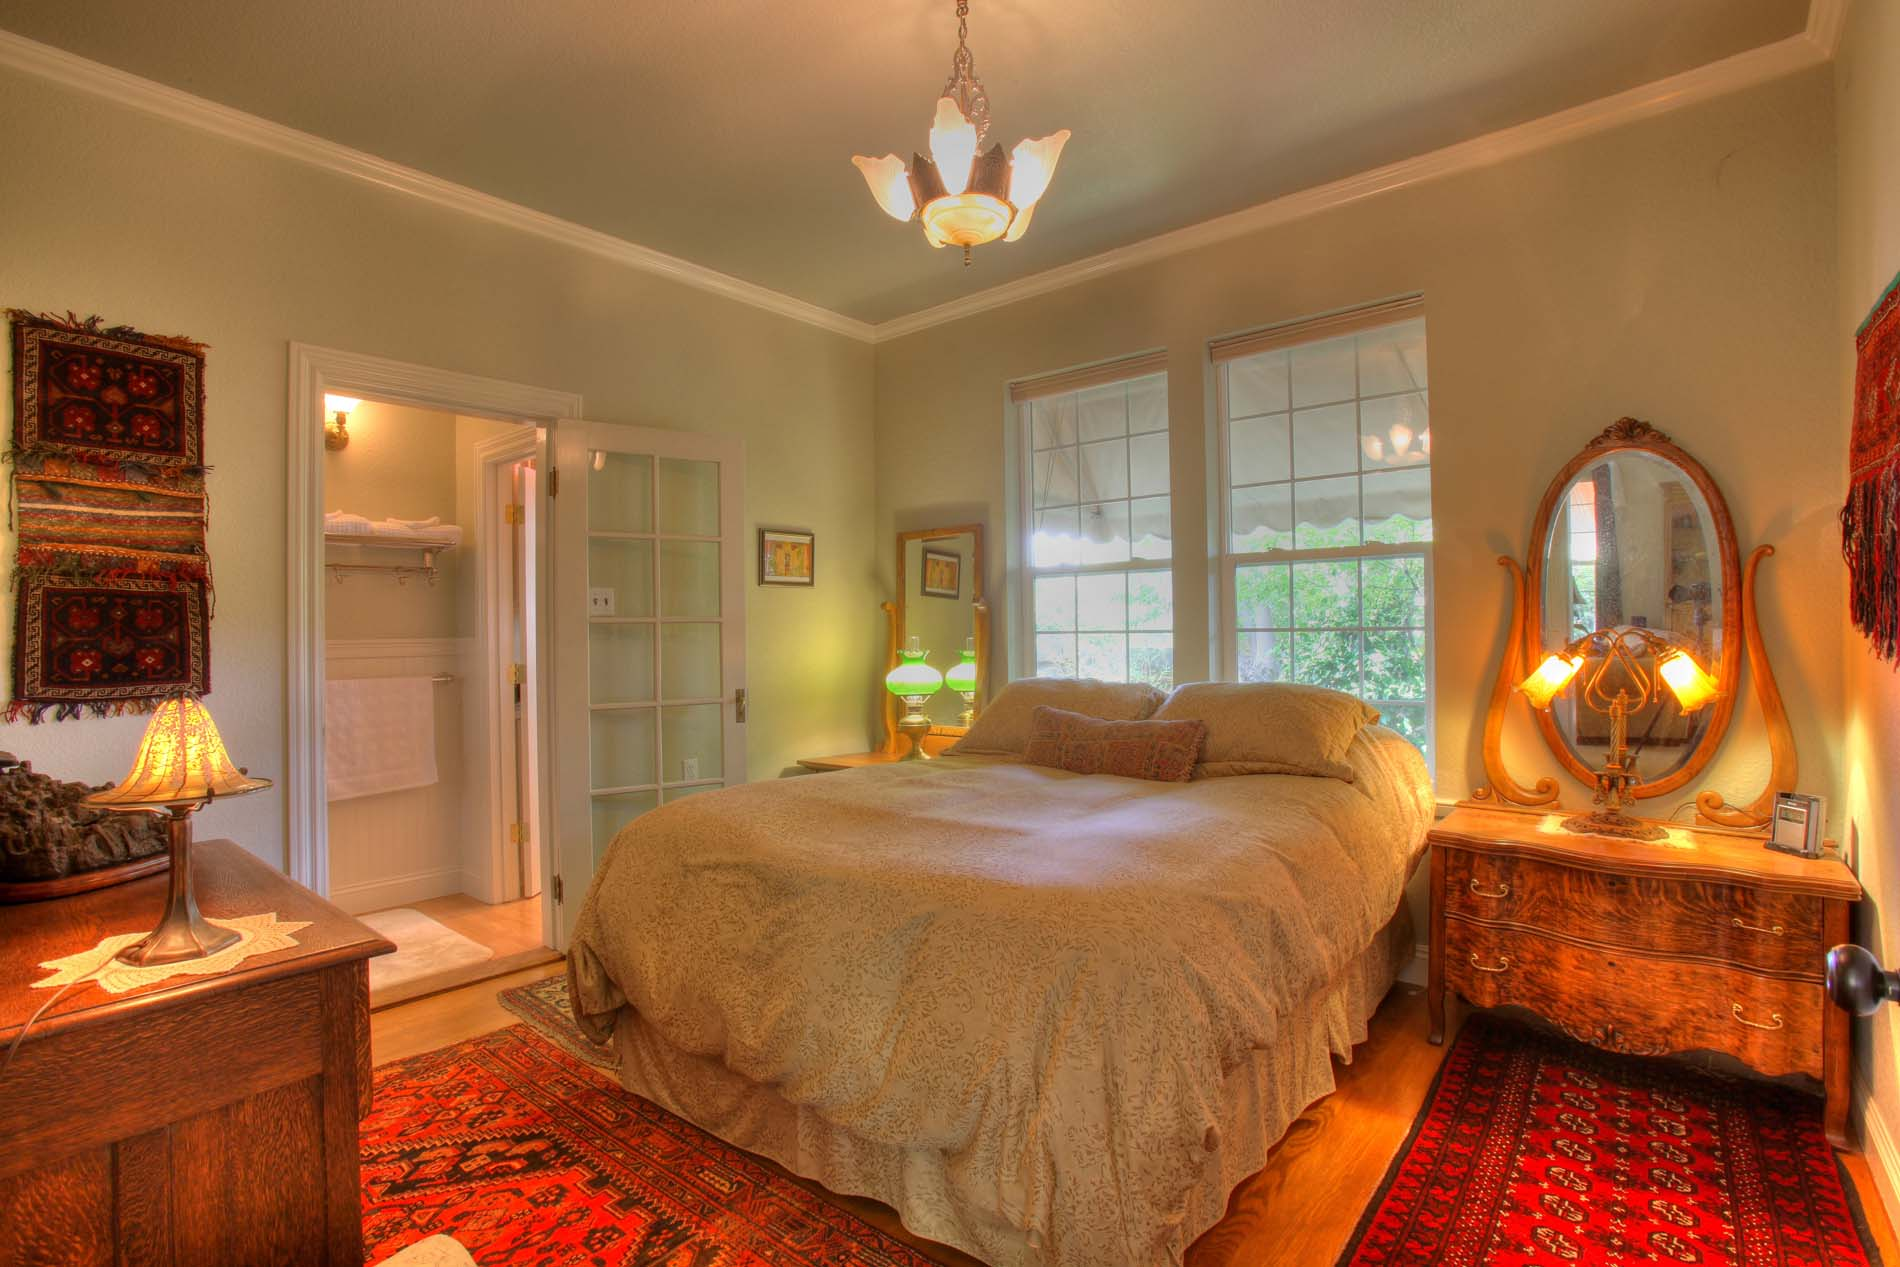 The Desmond Room